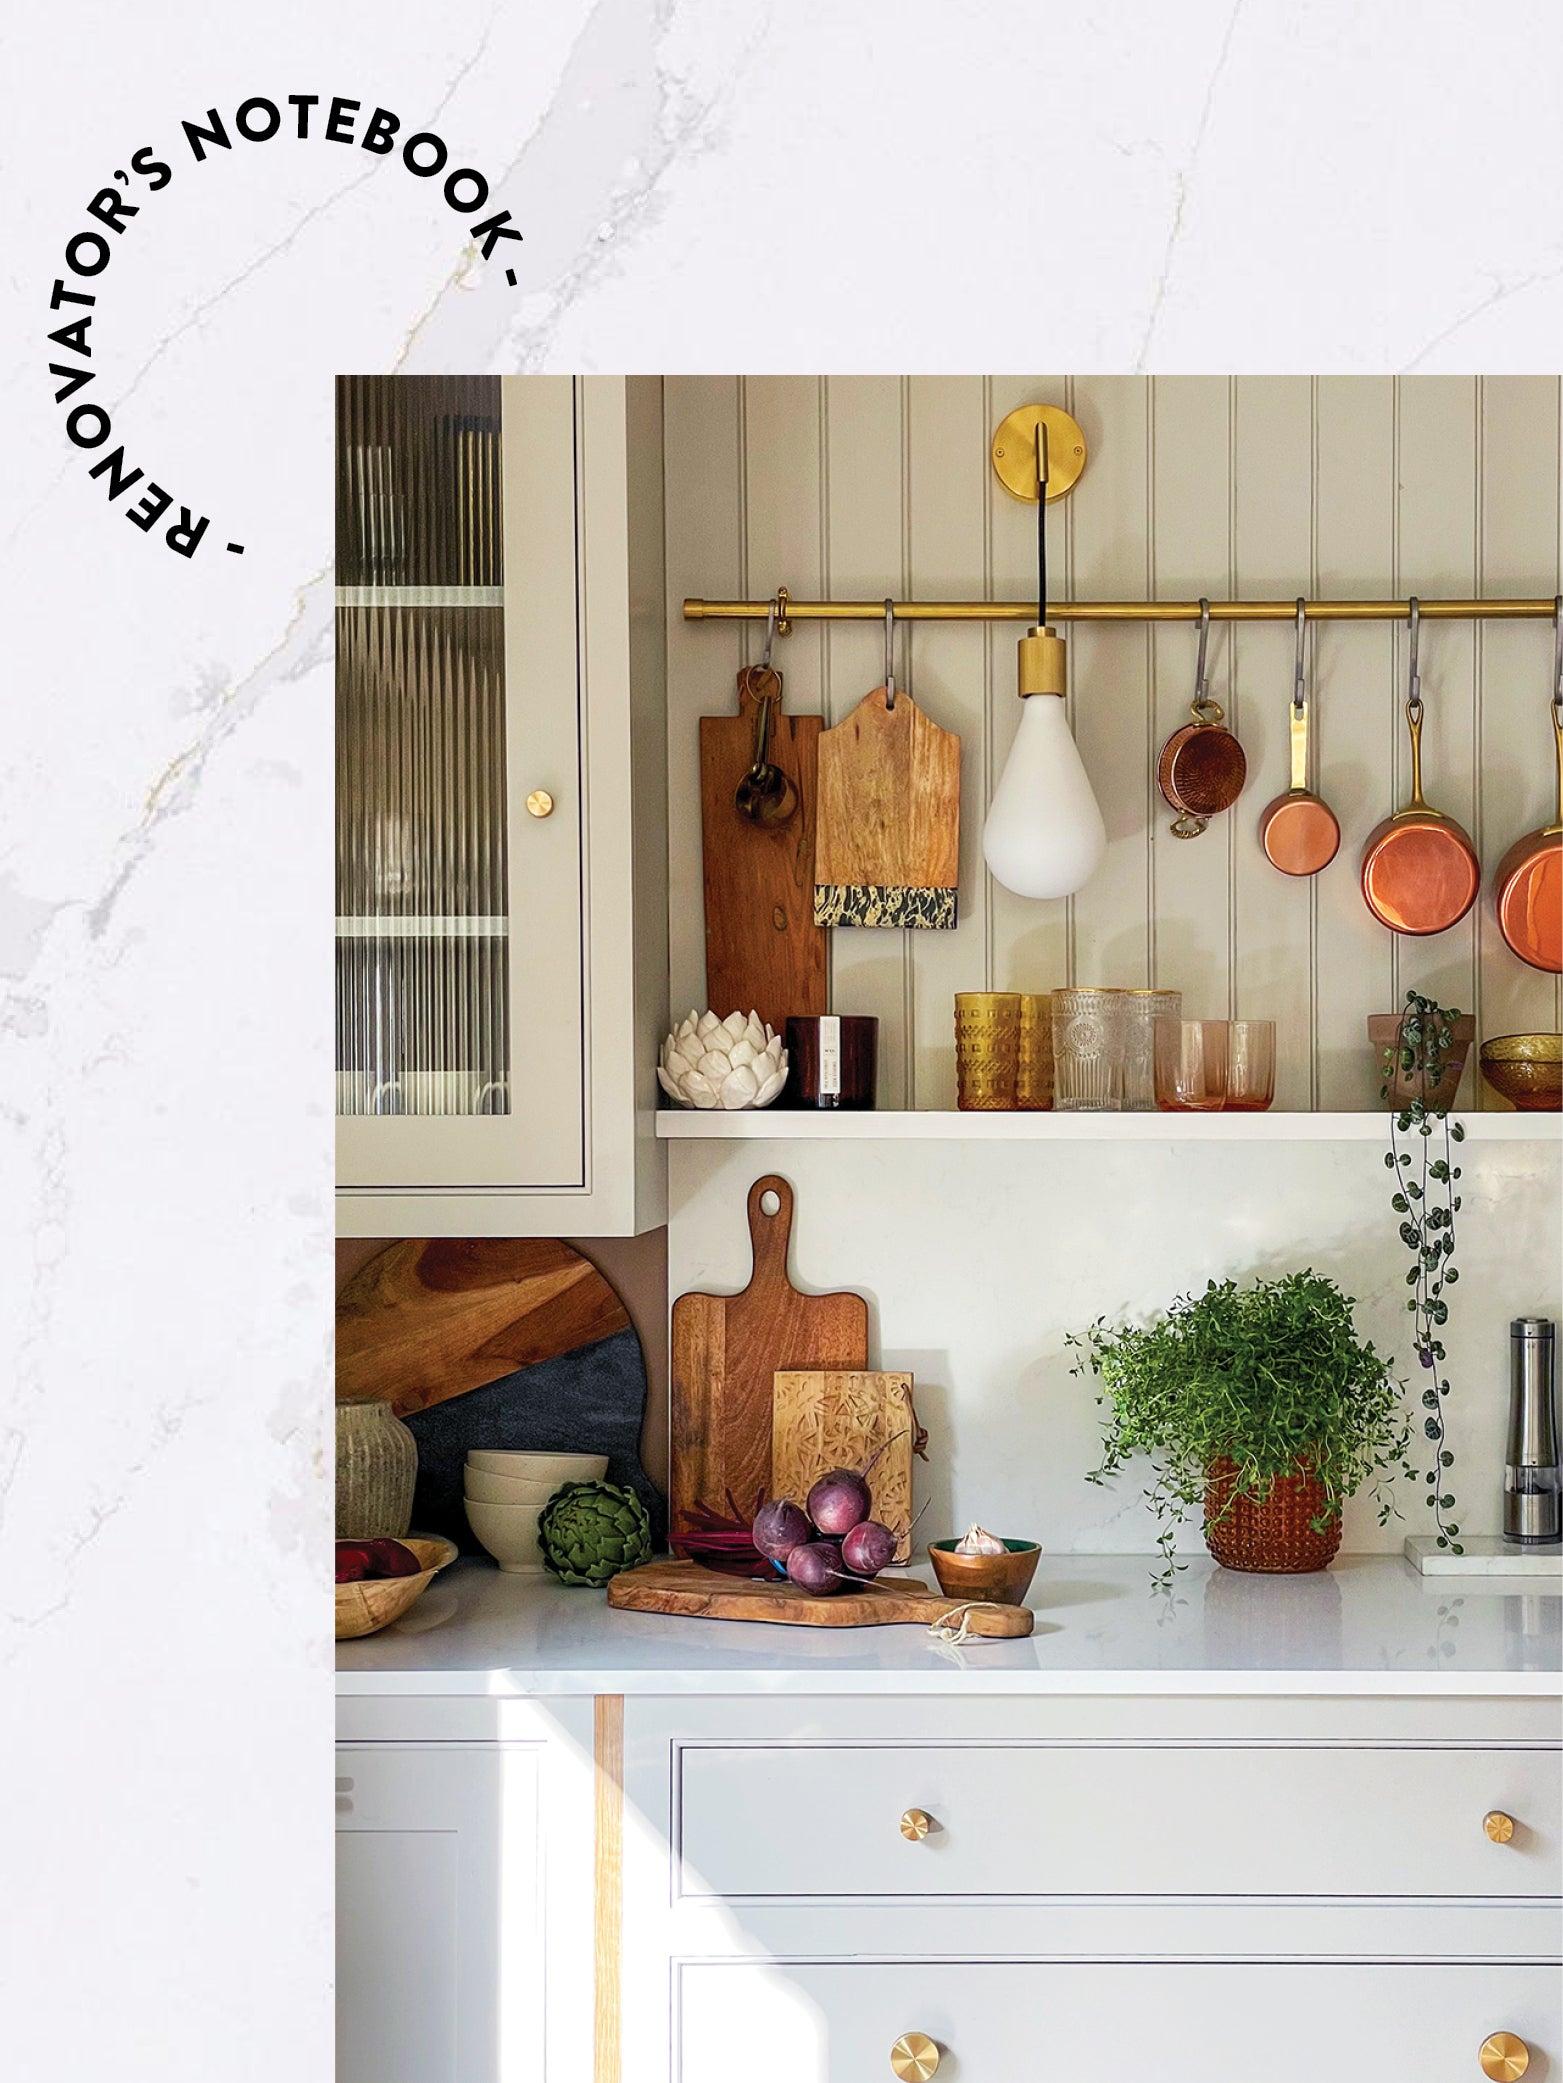 00-FEATURE-Renovators_Notebook_SharonHornsby